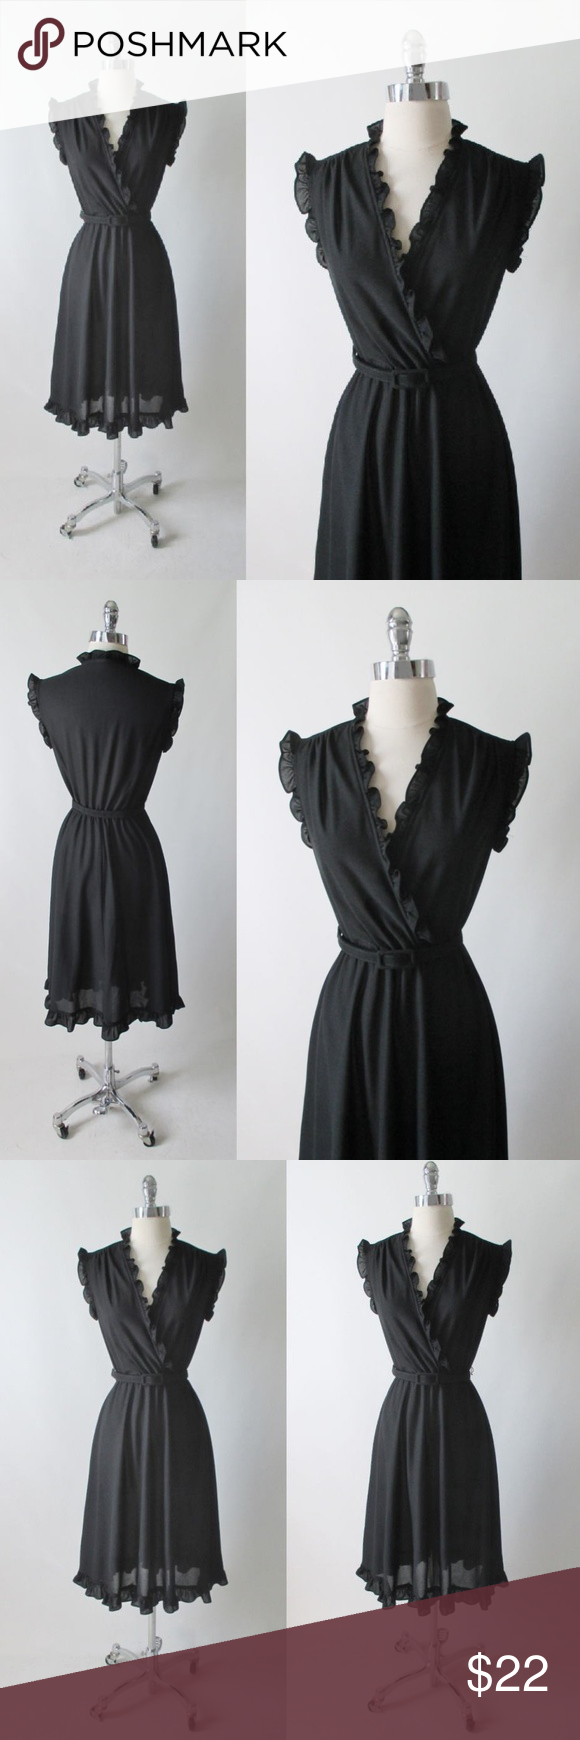 Vintage 70 S Black Ruffle Dress M Black Ruffle Dress Ruffle Dress Black Ruffle [ 1740 x 580 Pixel ]